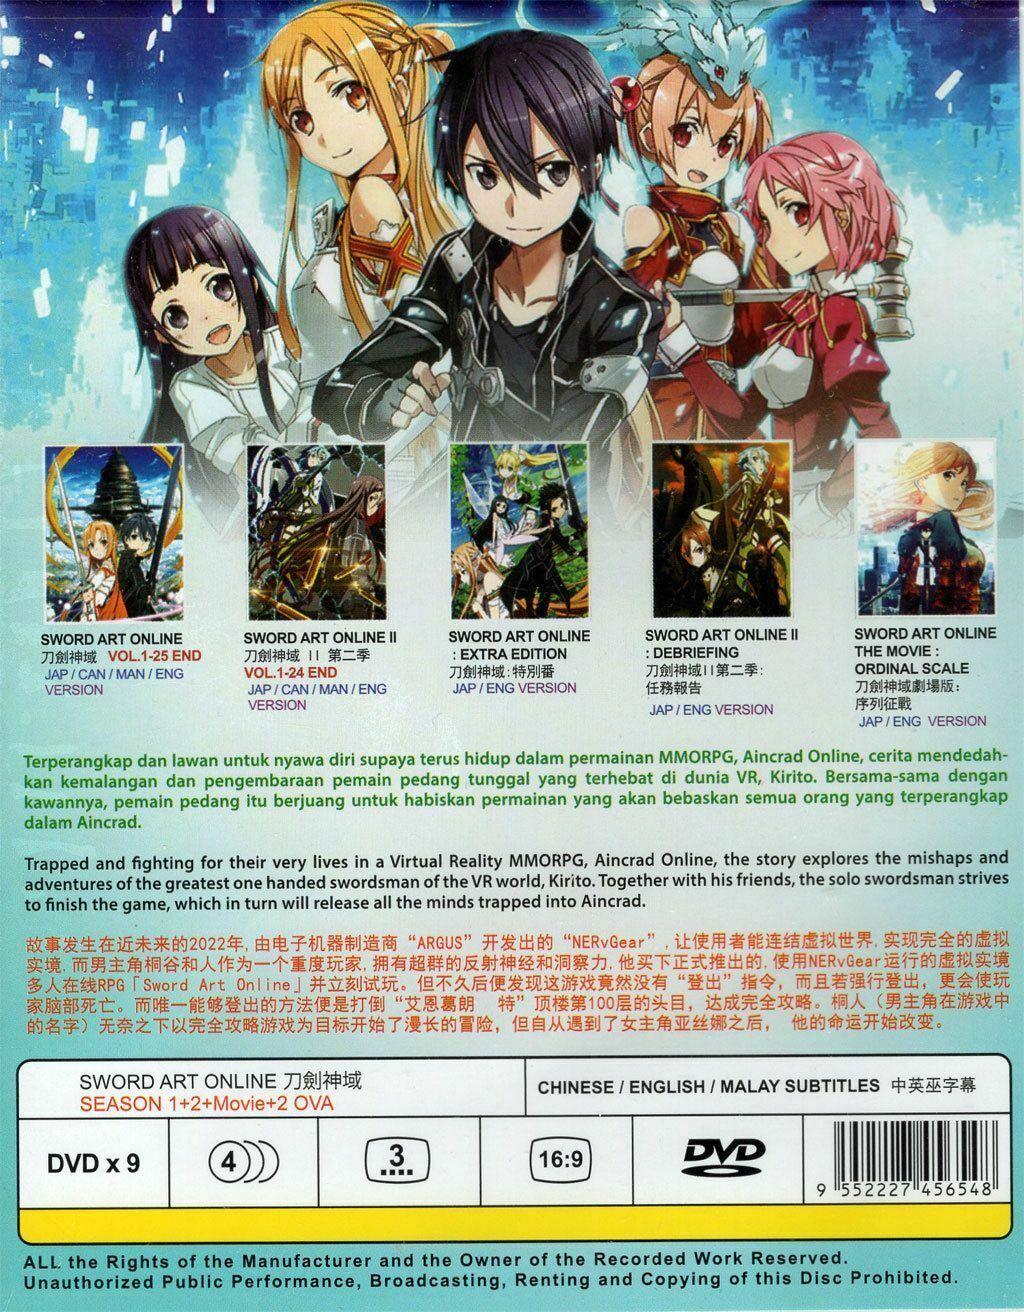 Sword Art Online DVD Complete Season 1+2 + Movie + 2 OVA Ship from USA